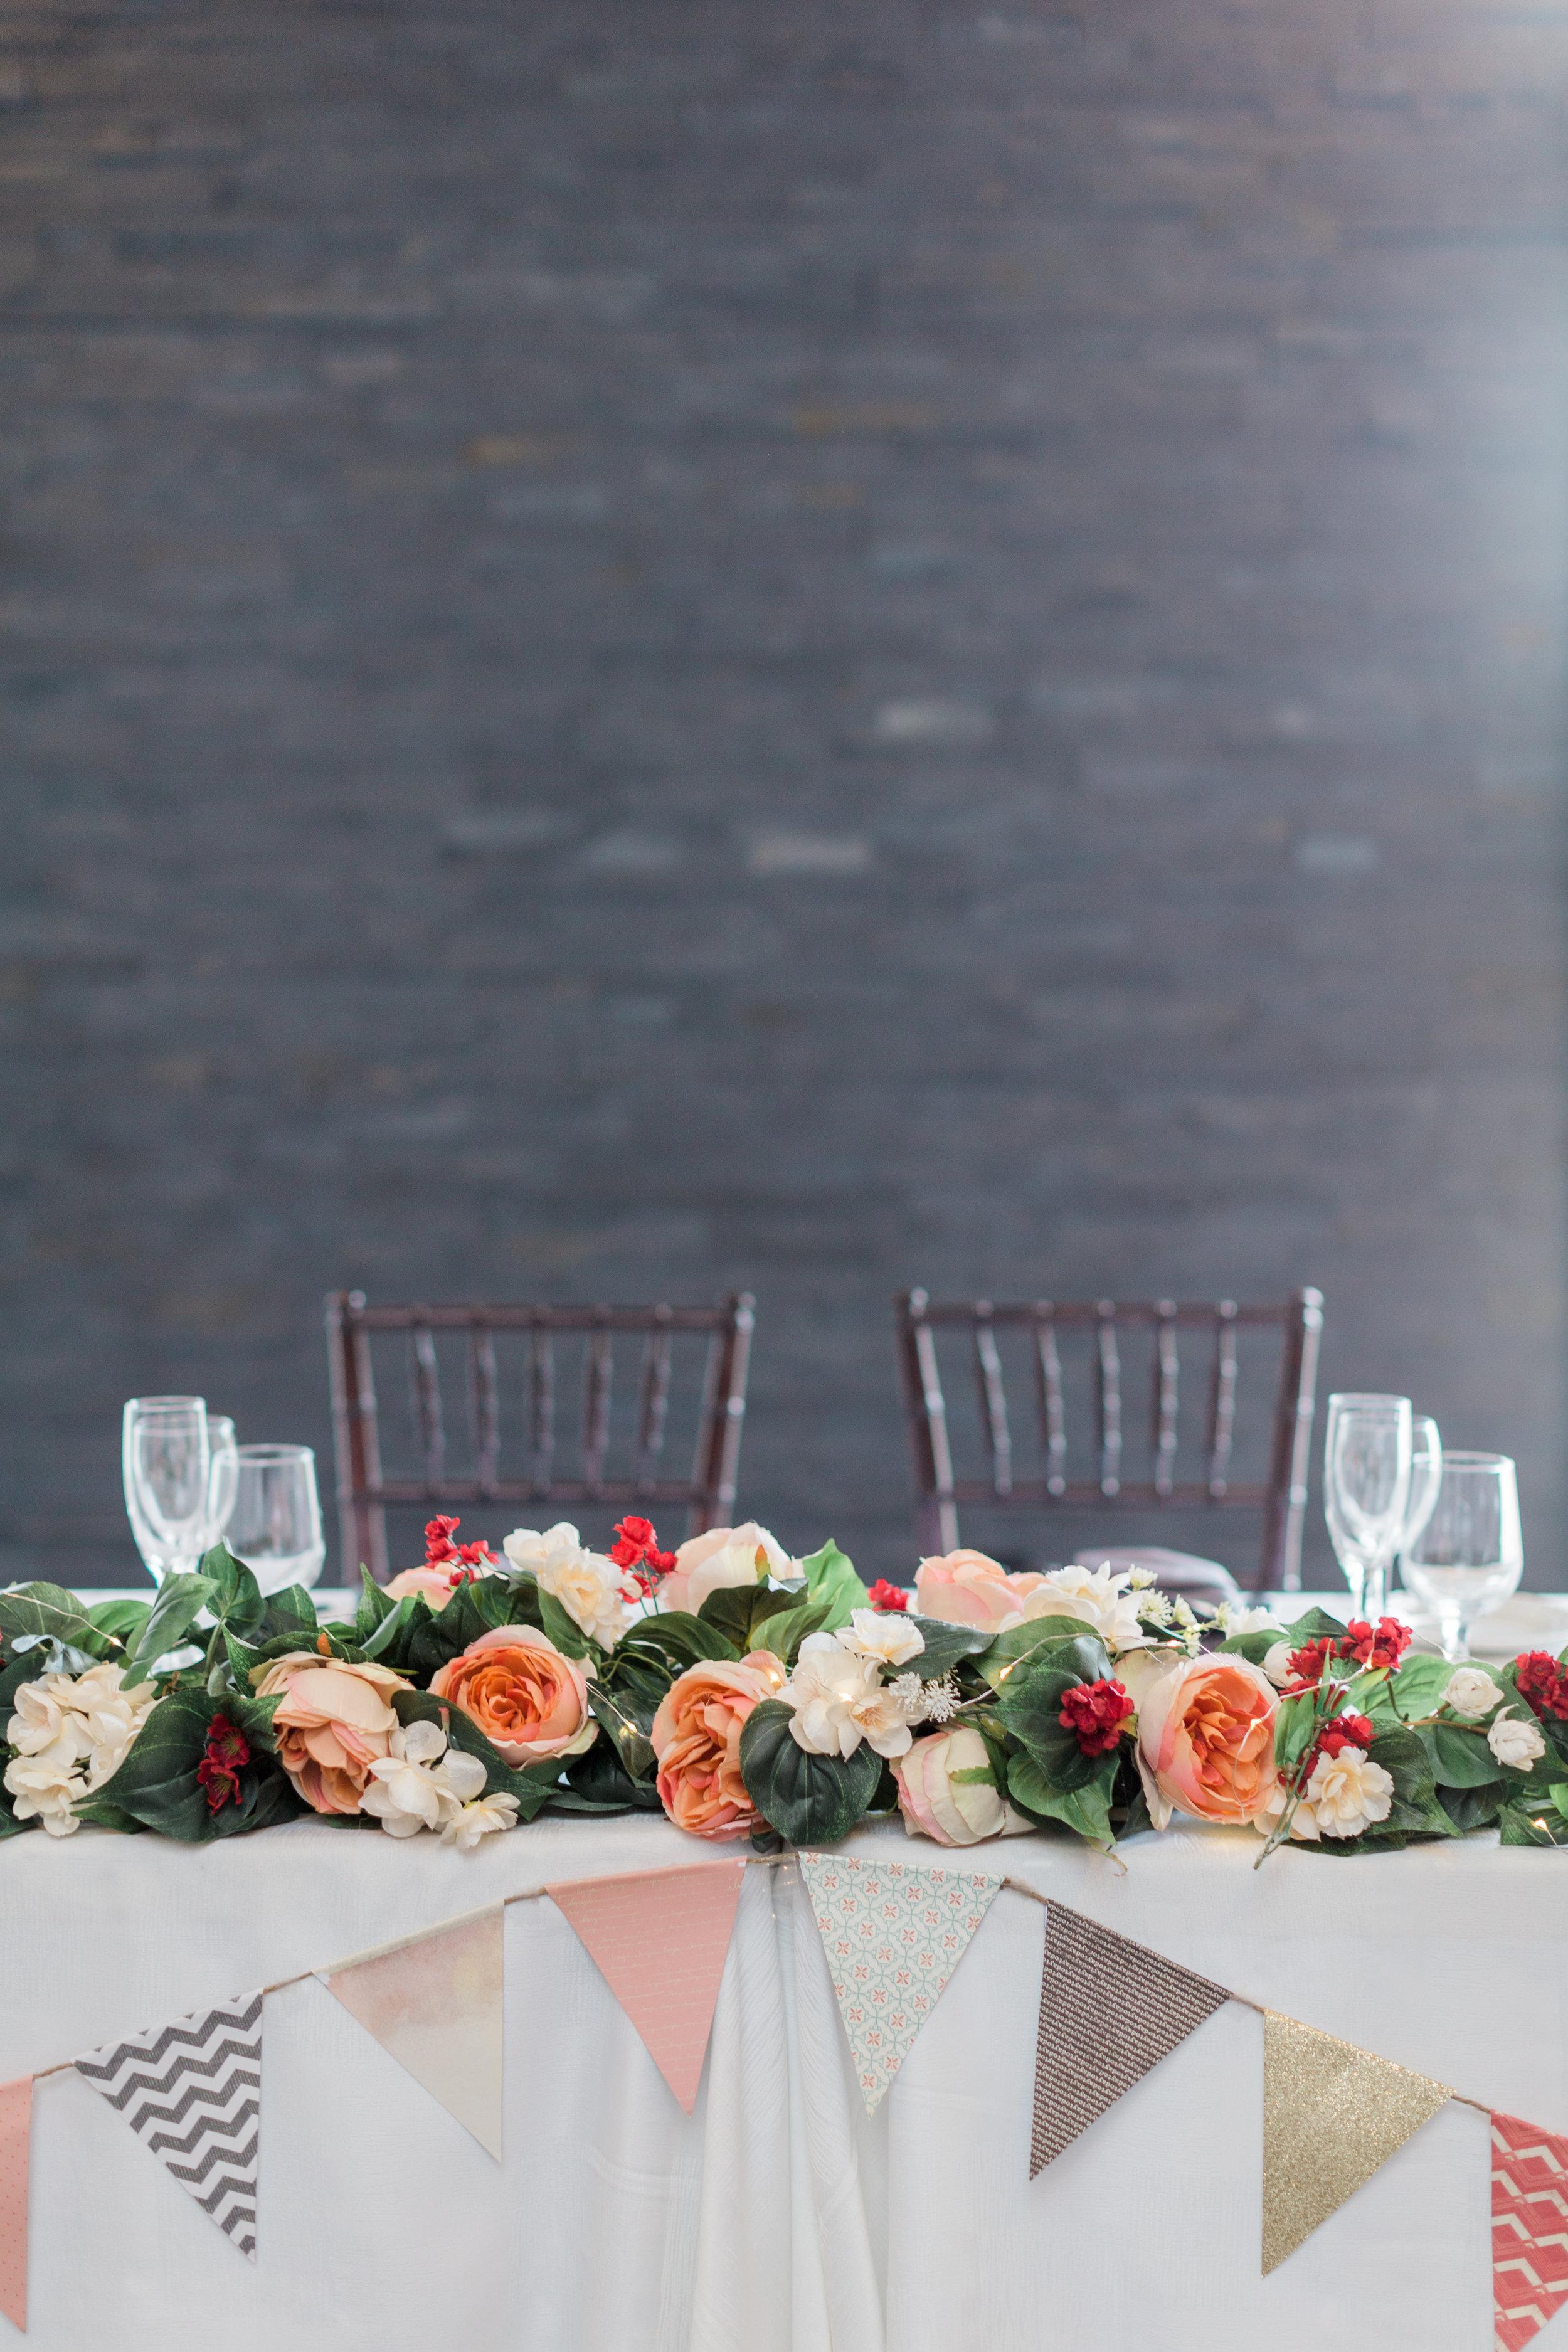 The Manor Winter Wedding - Reception-17.jpg